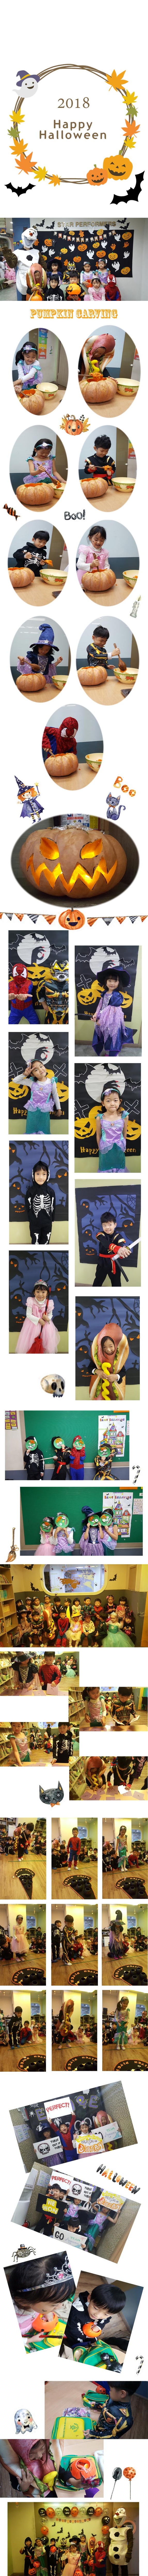 2018_Halloween_Kinder_grace.jpg